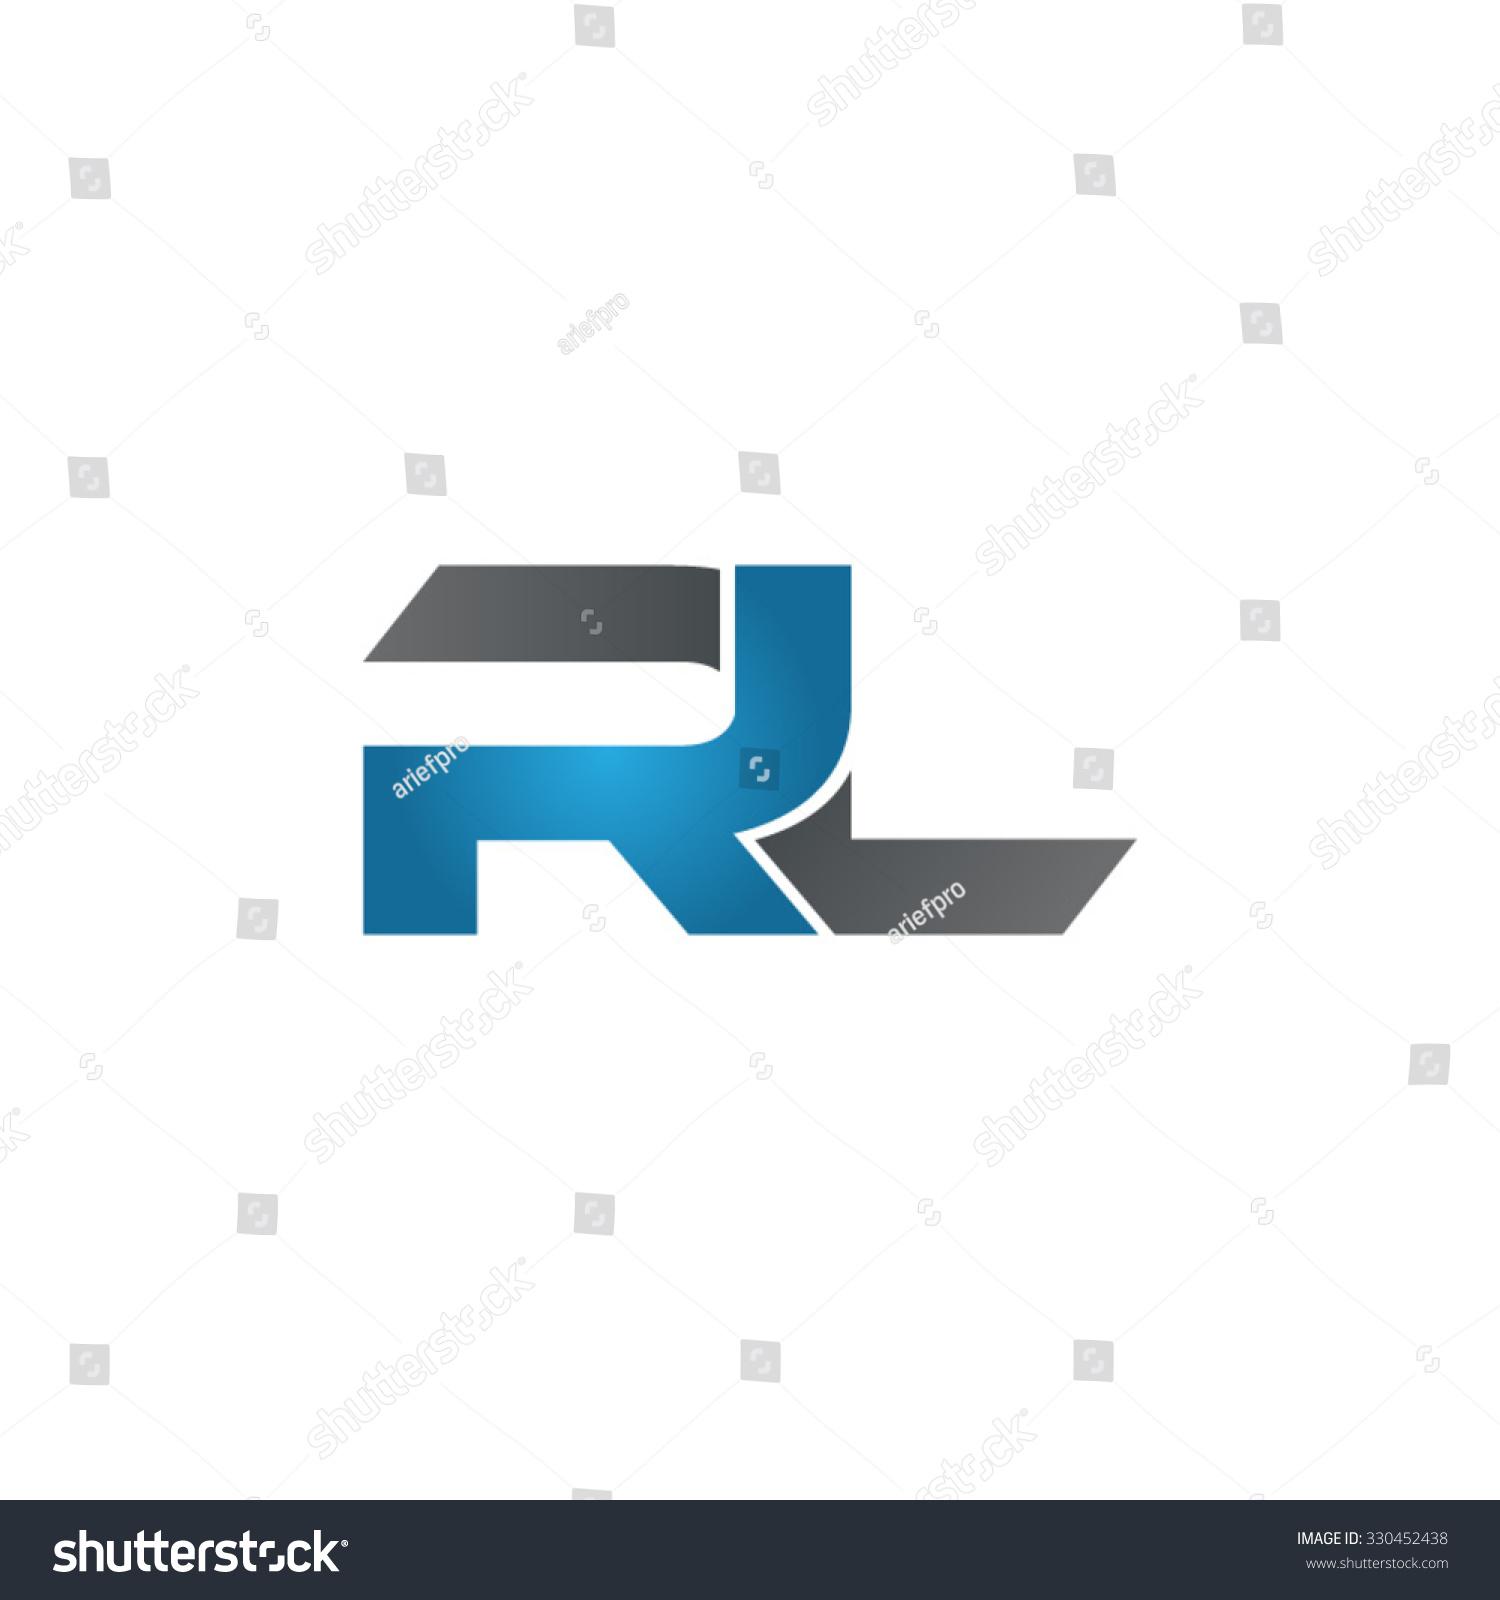 Tj initial luxury ornament monogram logo stock vector - Rl Company Linked Letter Logo Blue